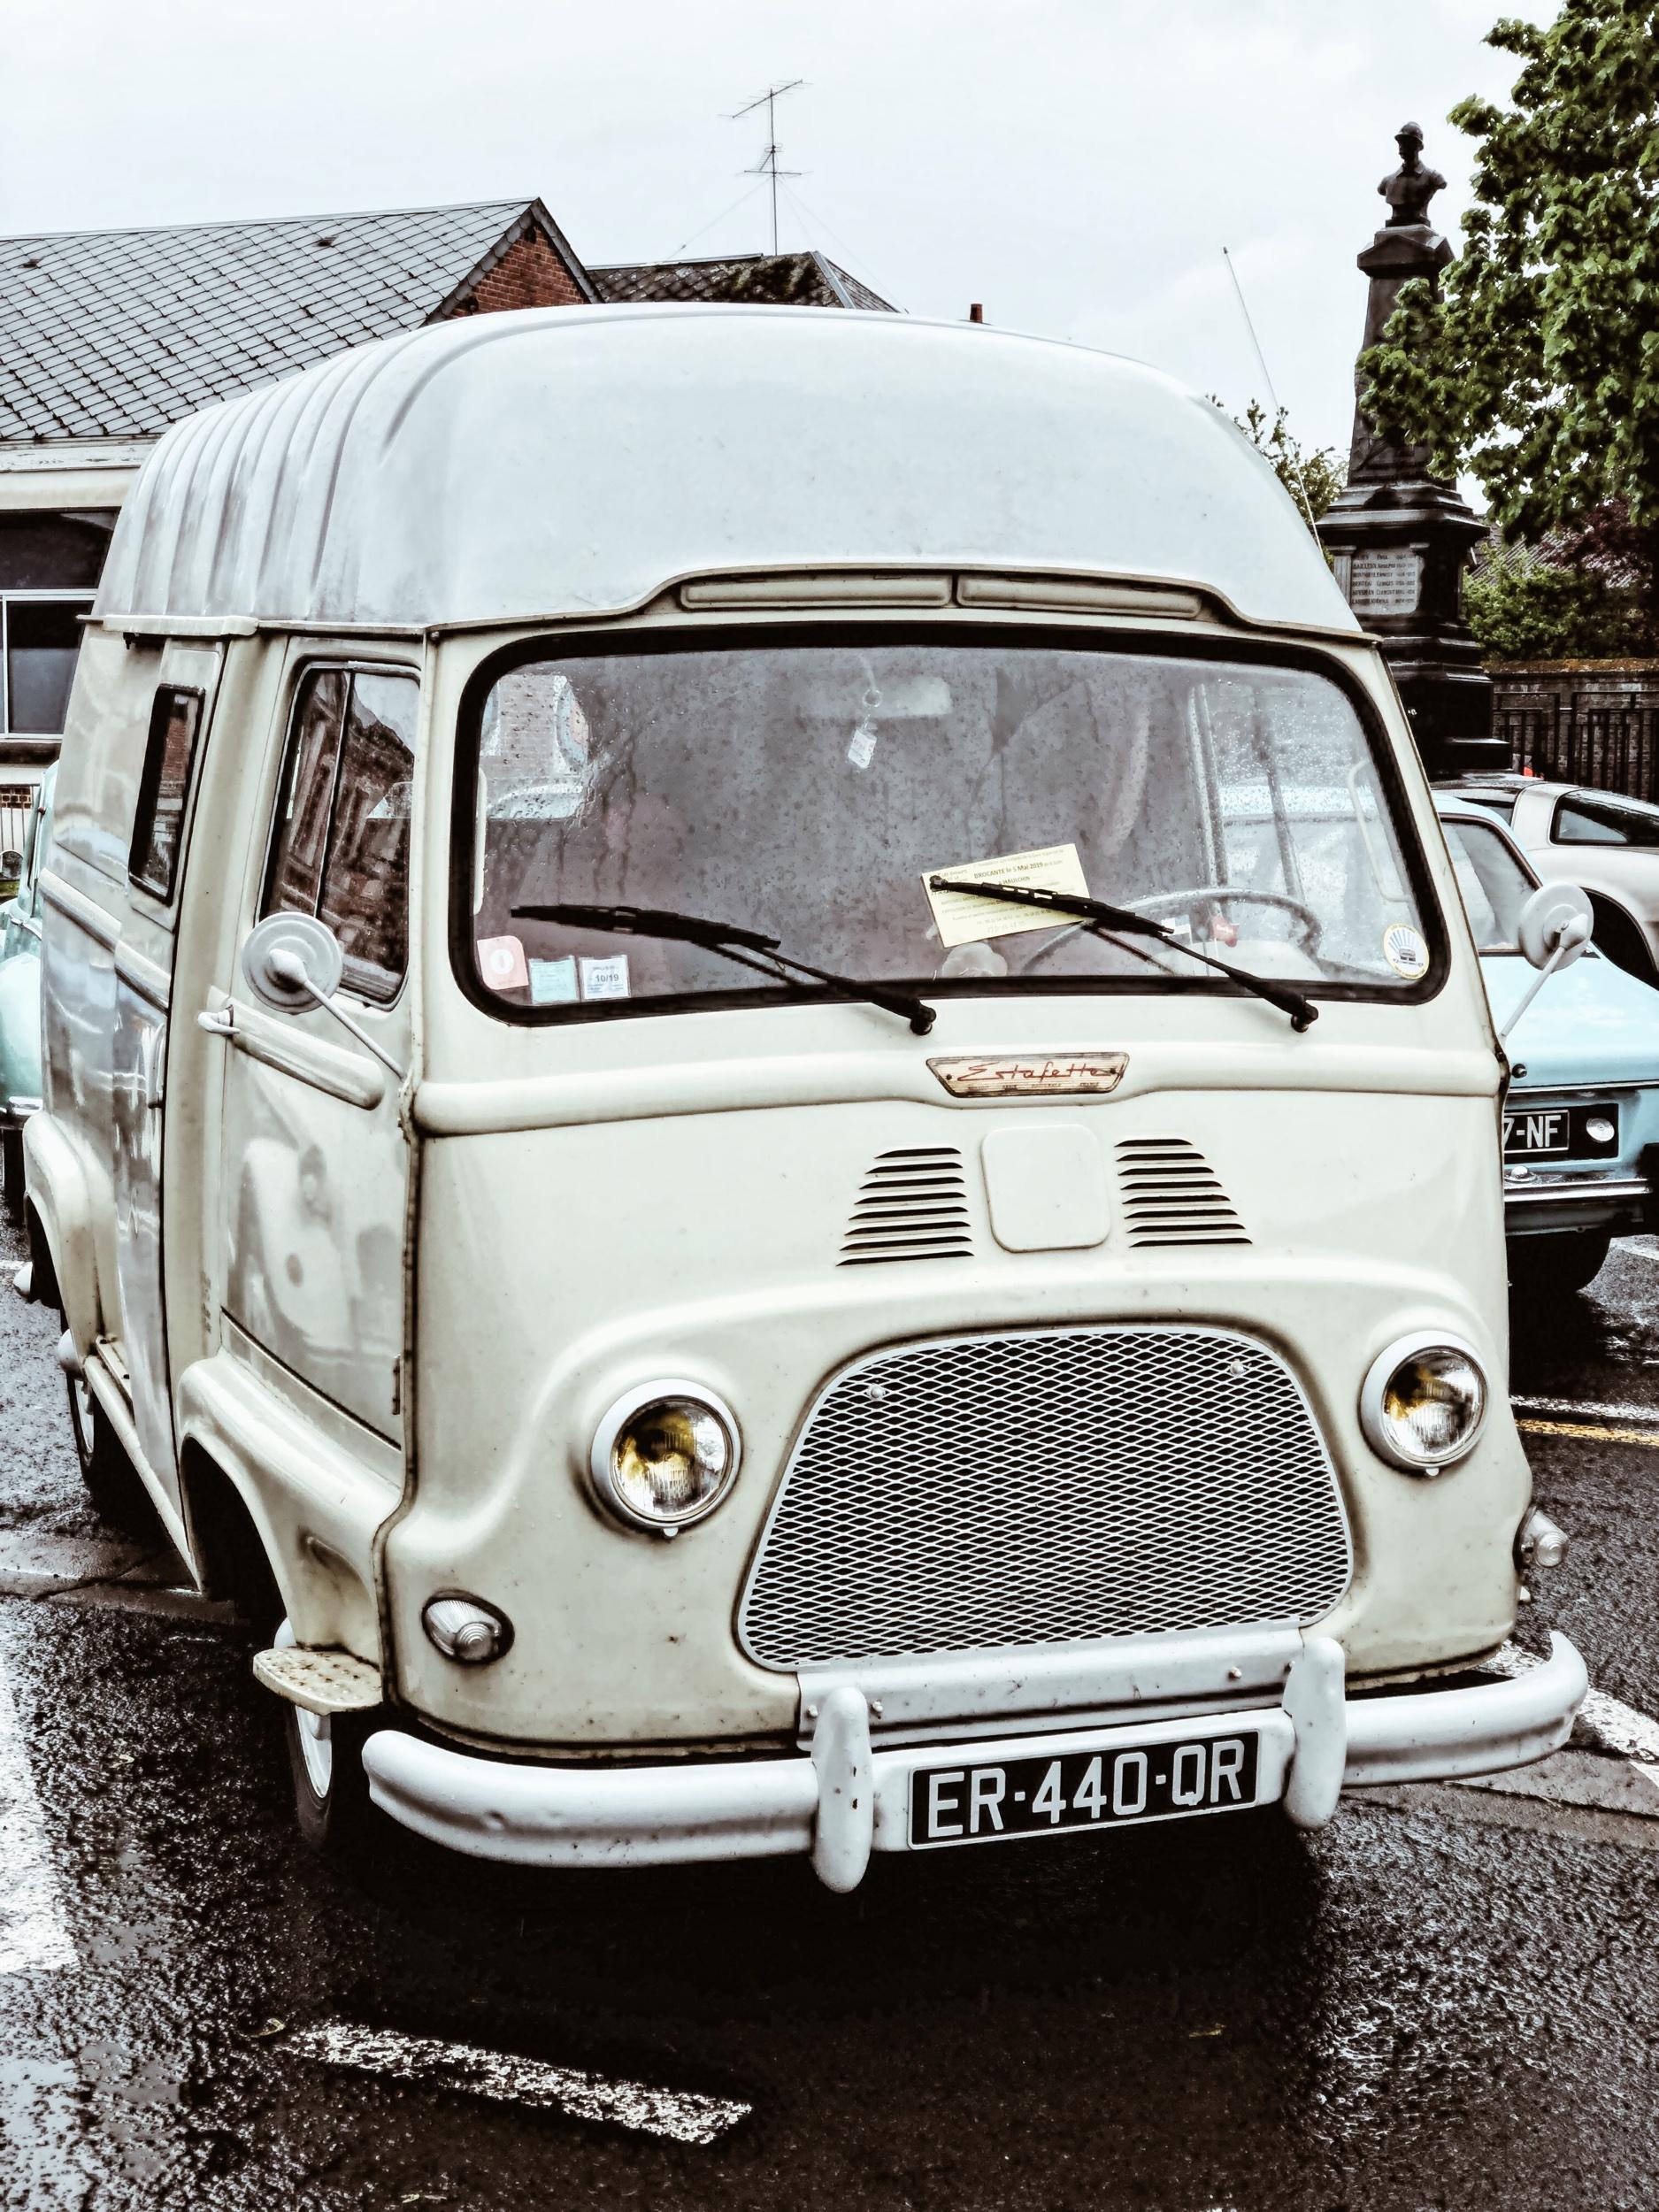 Carnet Sauvage - Blog mode, lifestyle et voyages, direction artistique Lille - Vintage Cars